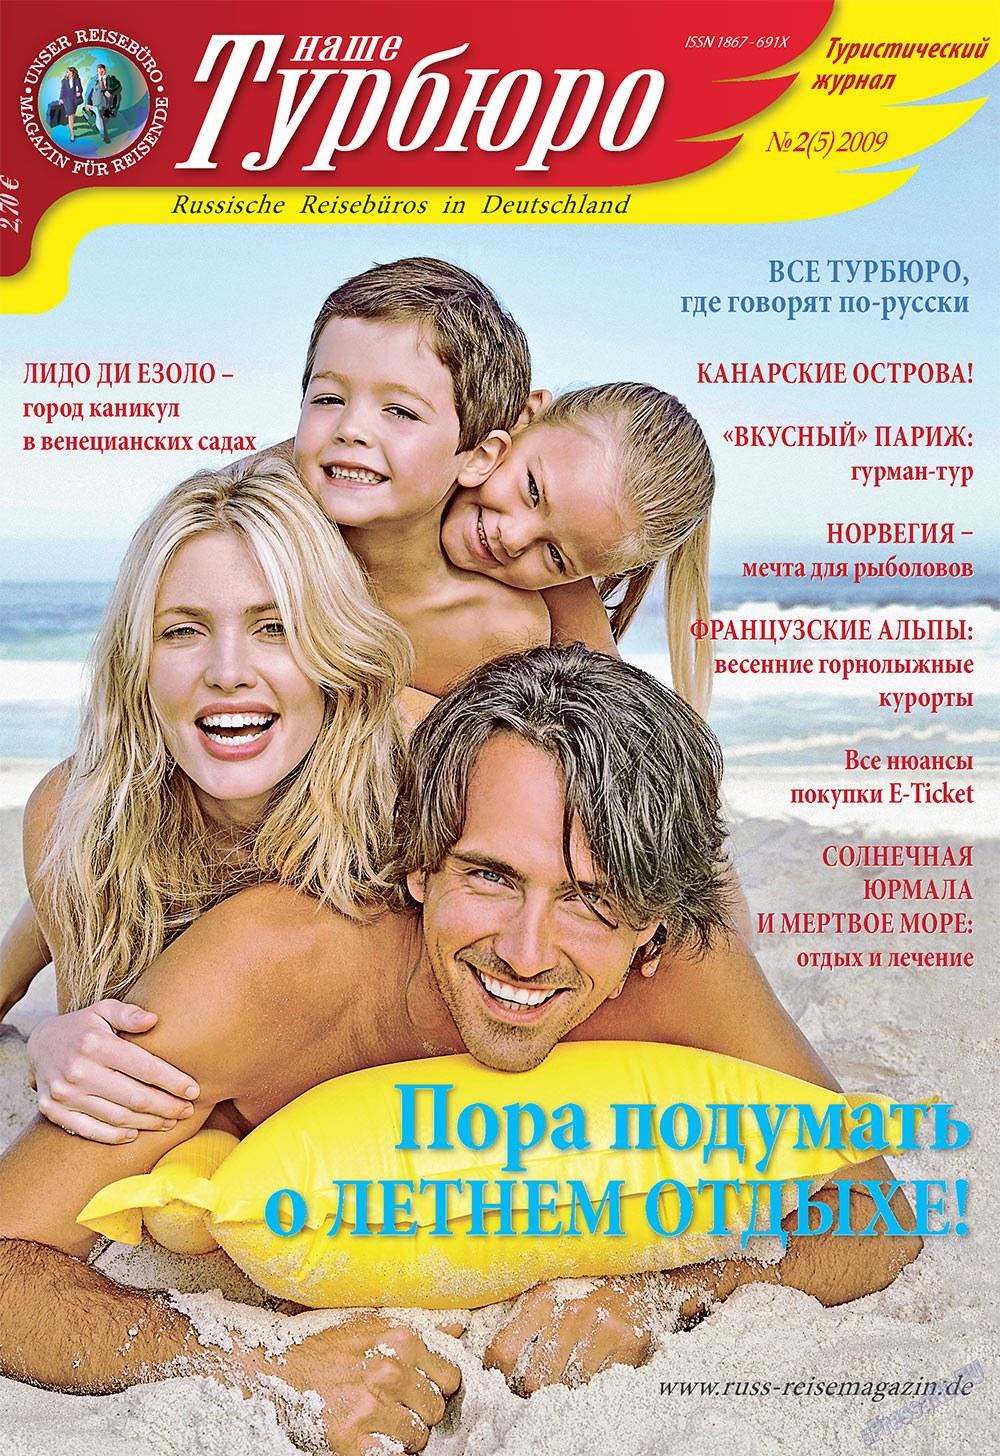 Наше Турбюро (журнал). 2009 год, номер 2, стр. 1